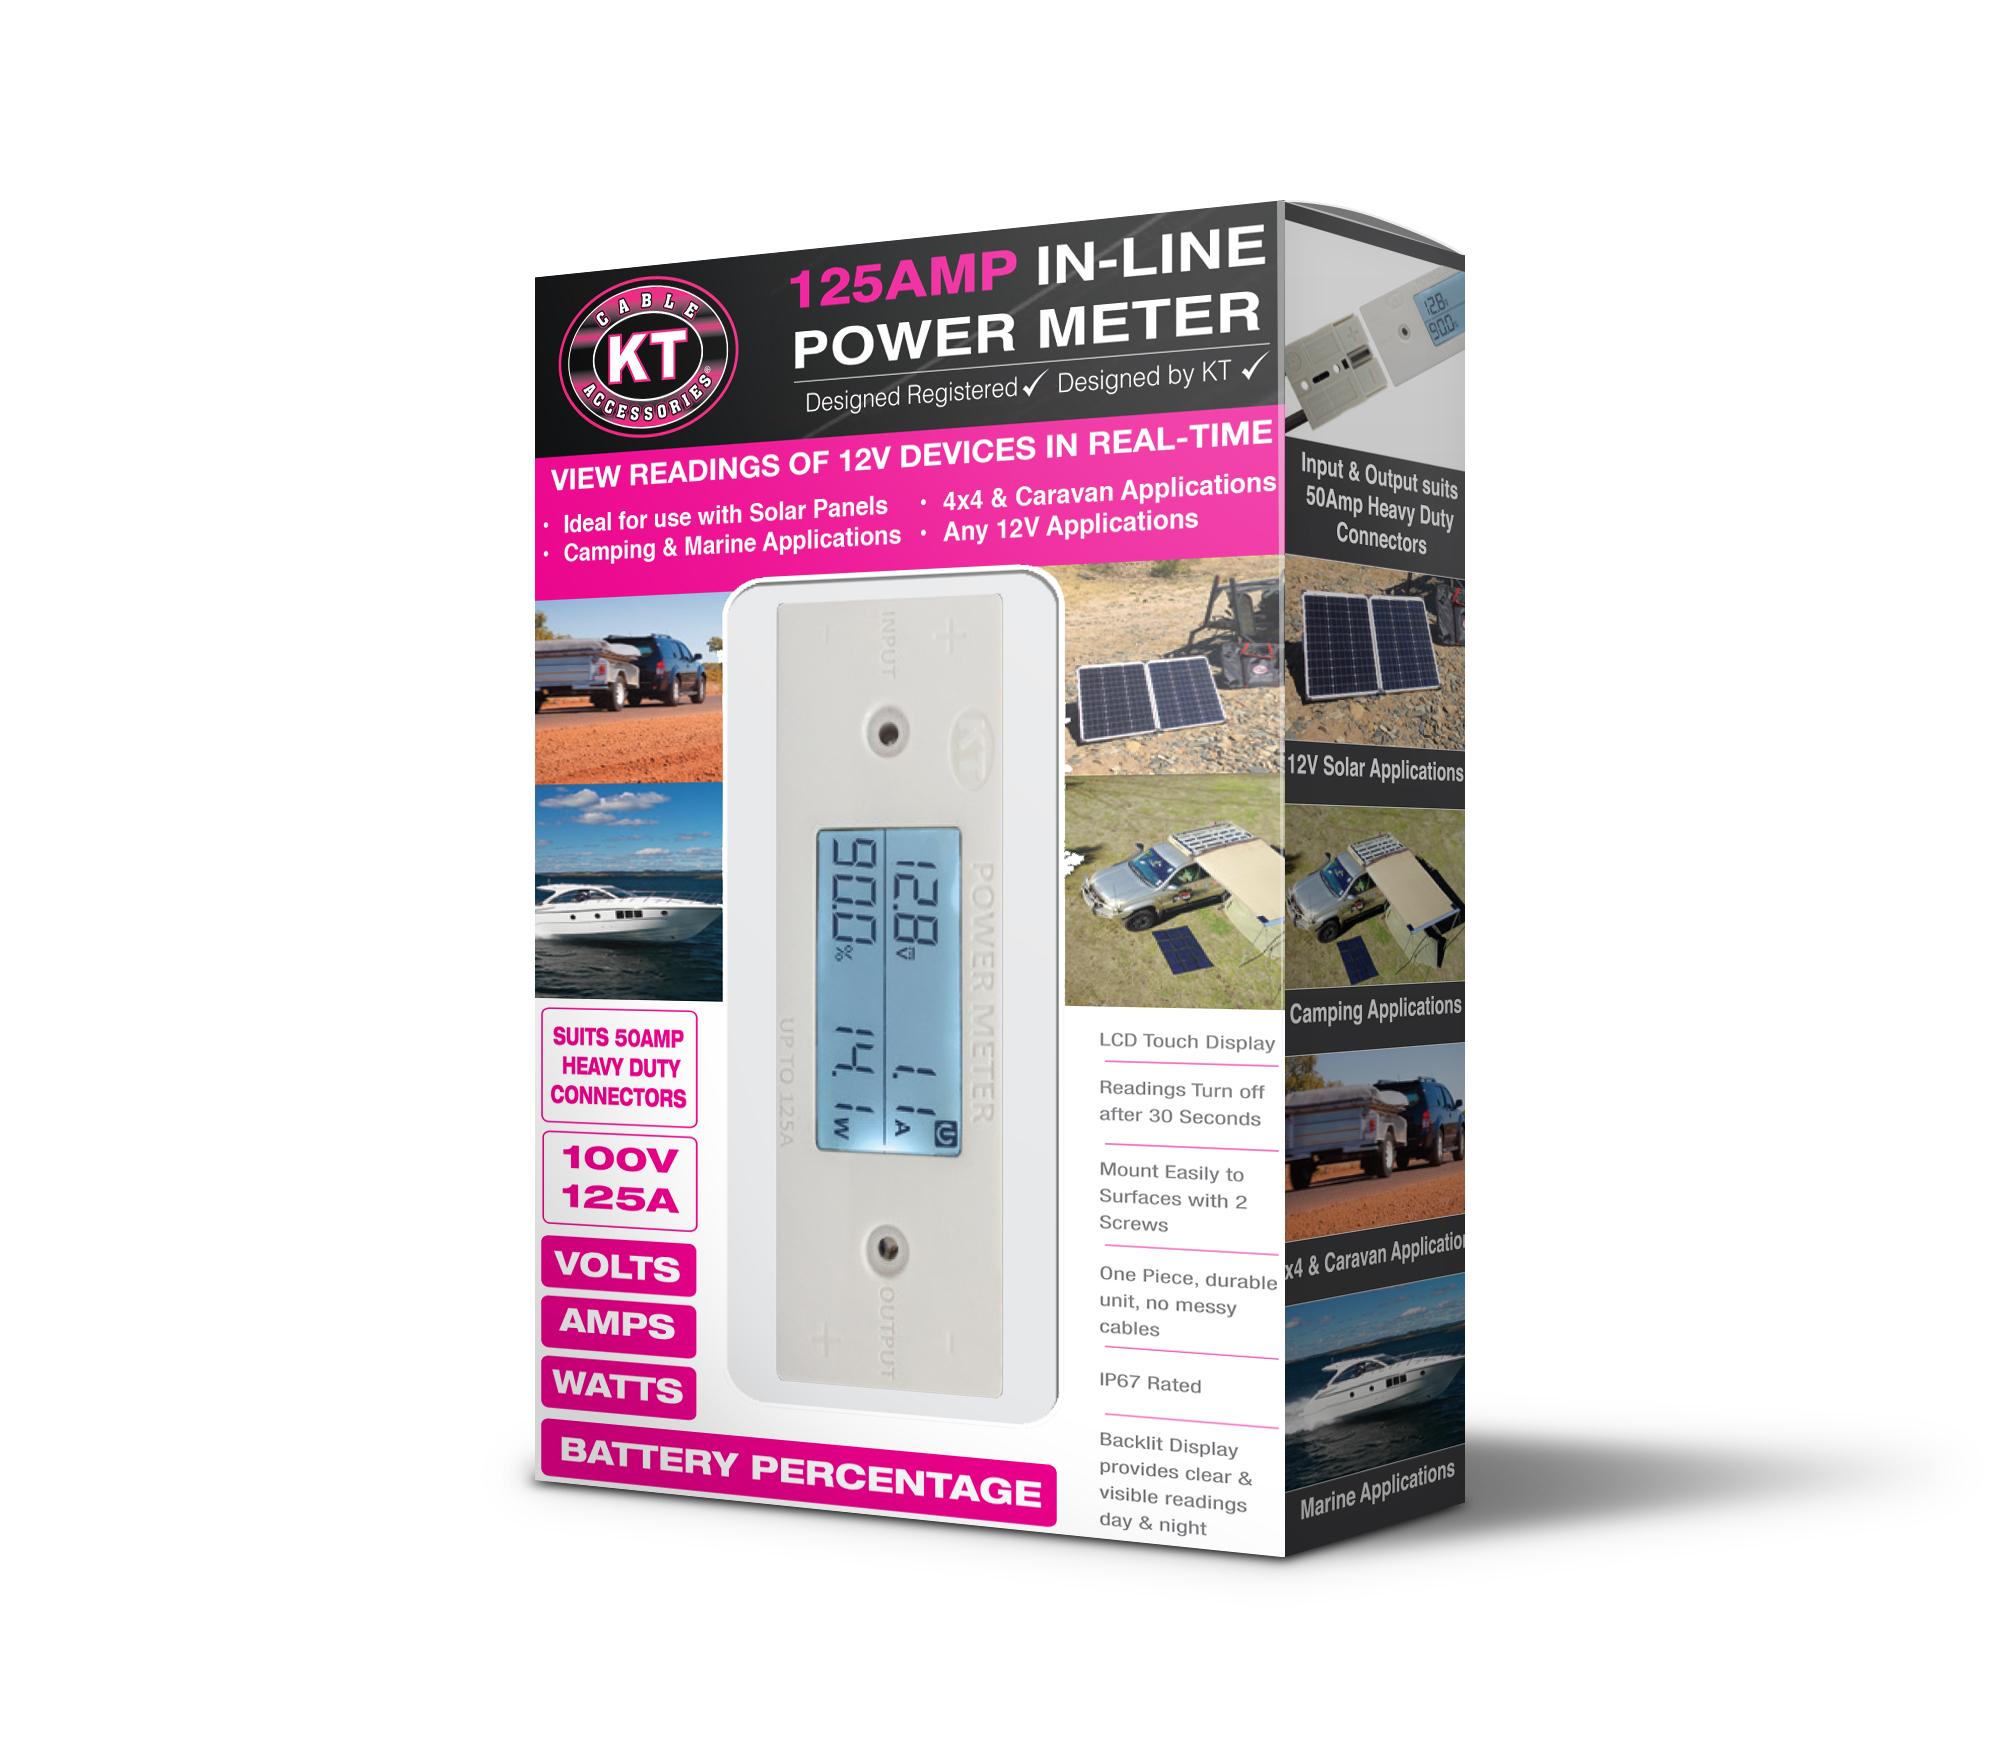 KT70752 - 125Amp, 100V In-Line Power Meter